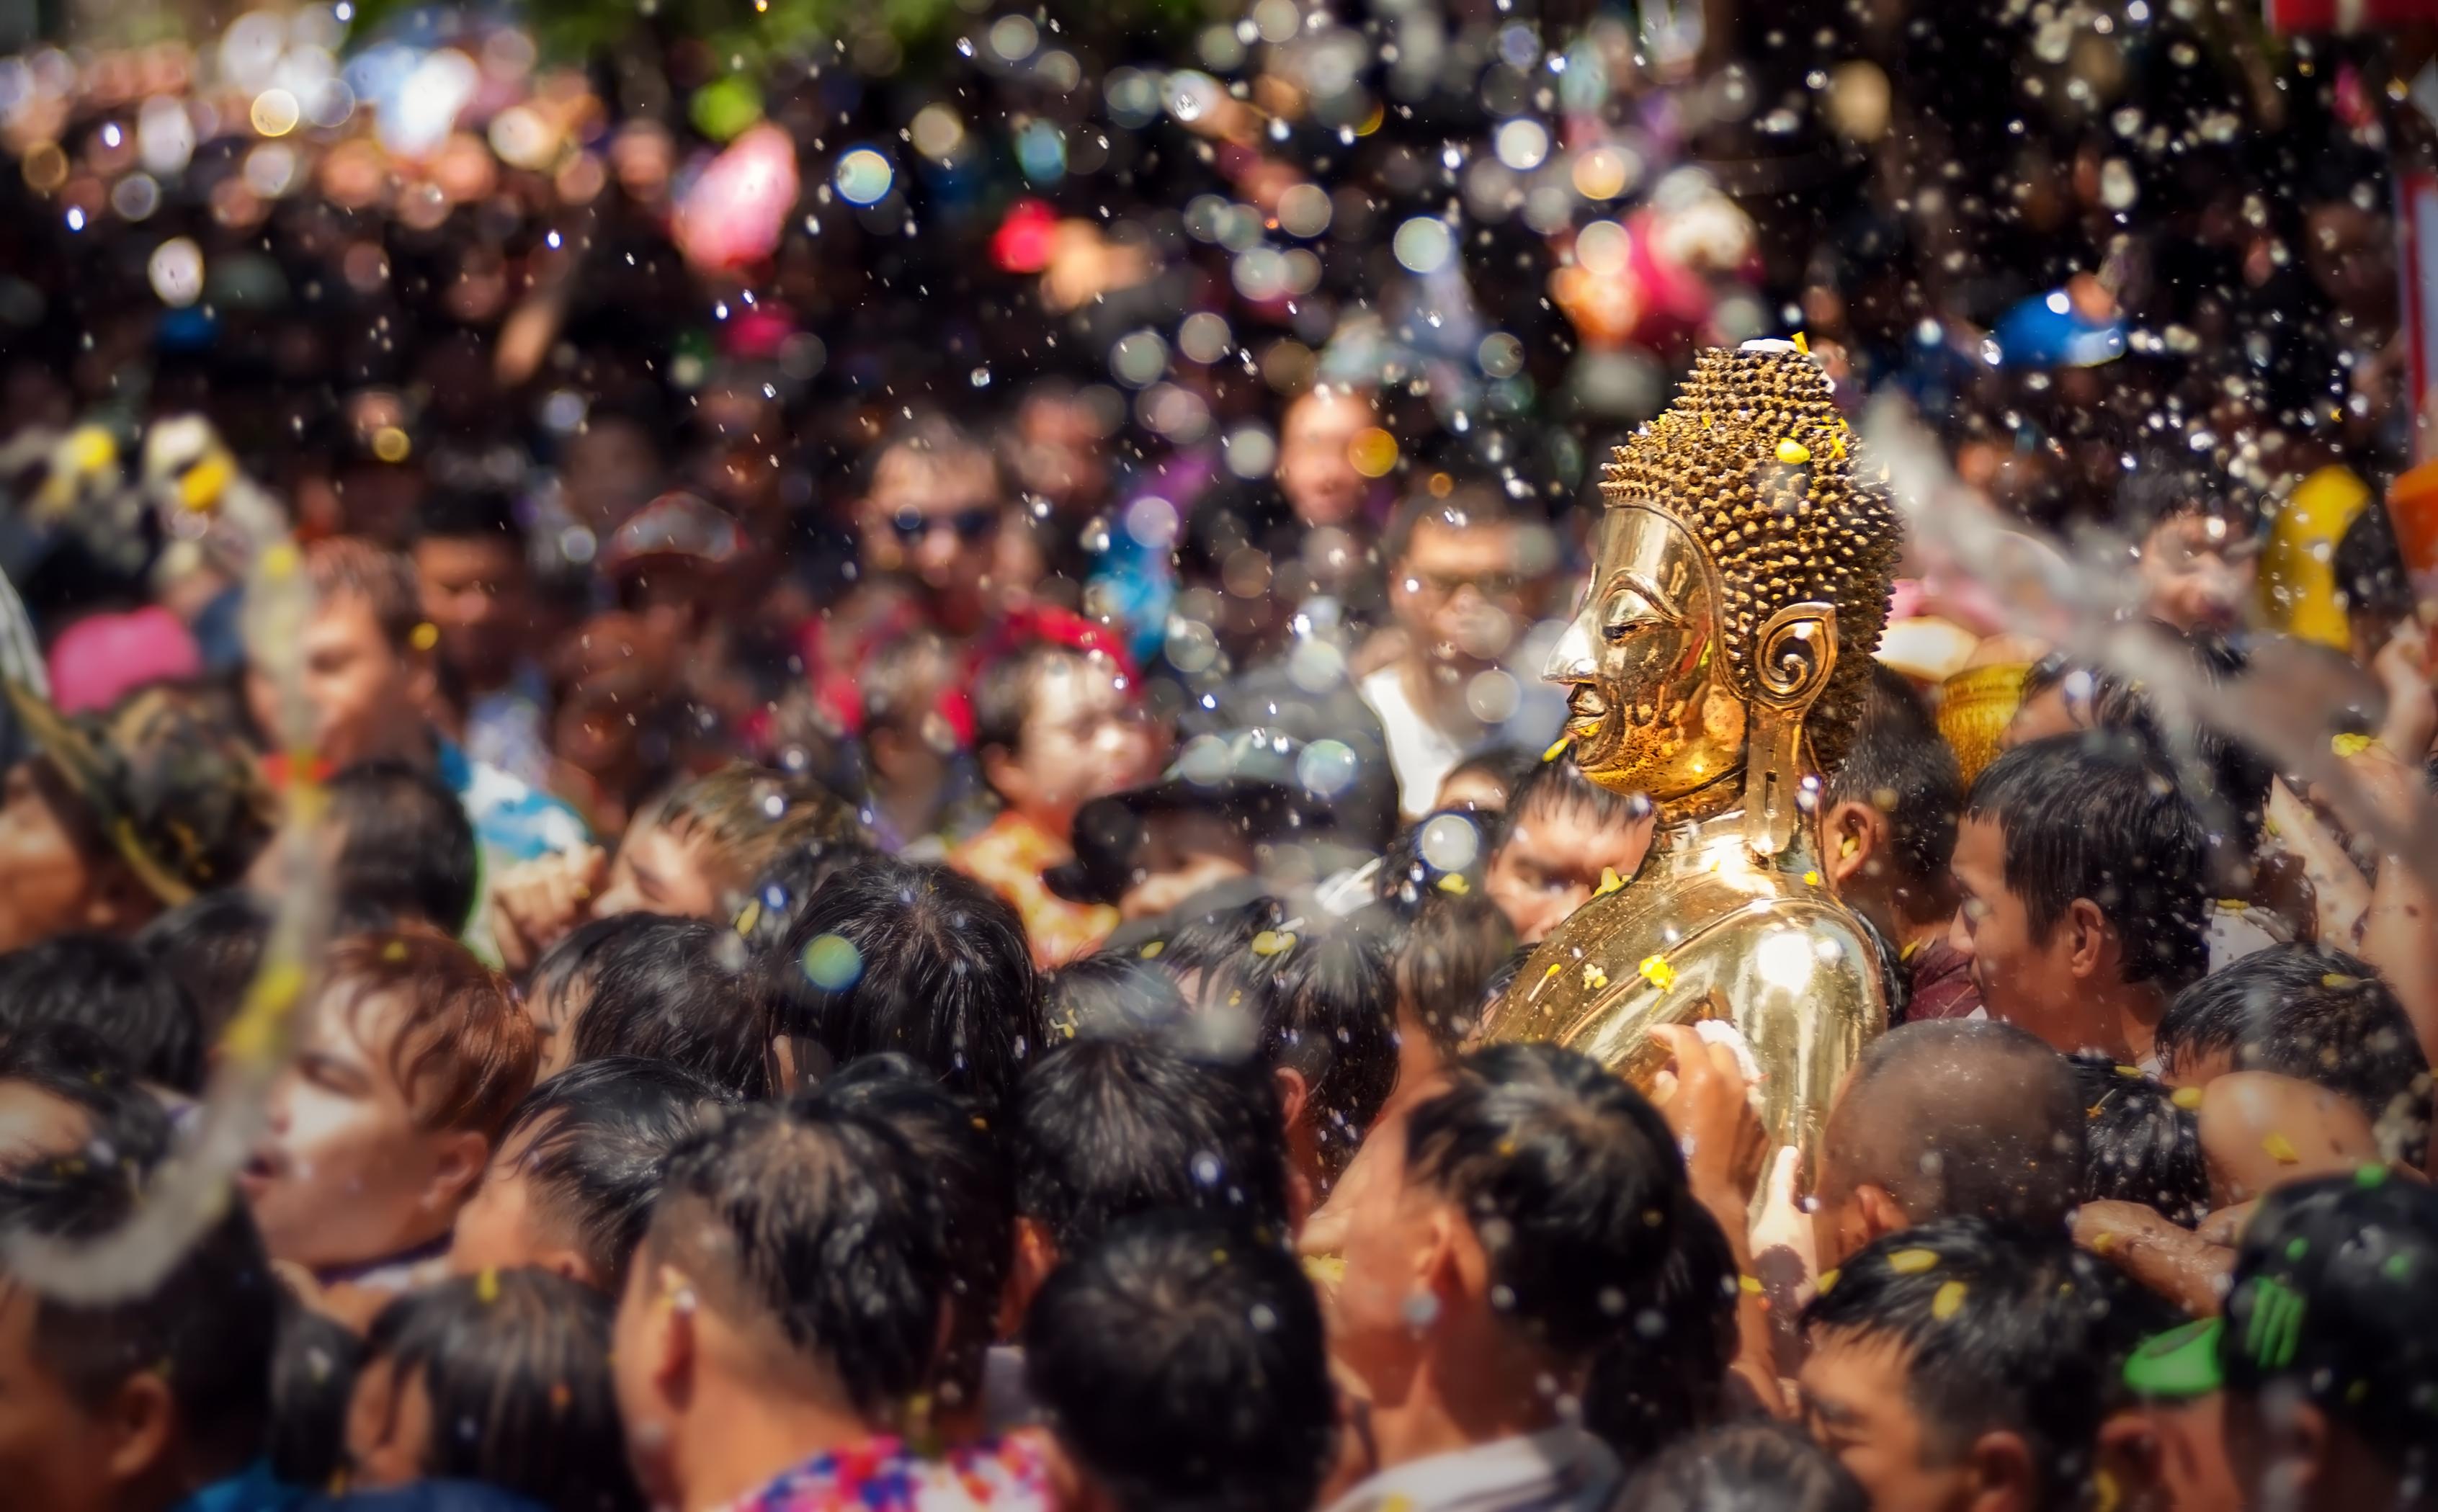 Buddha statue at the Songkran Festival